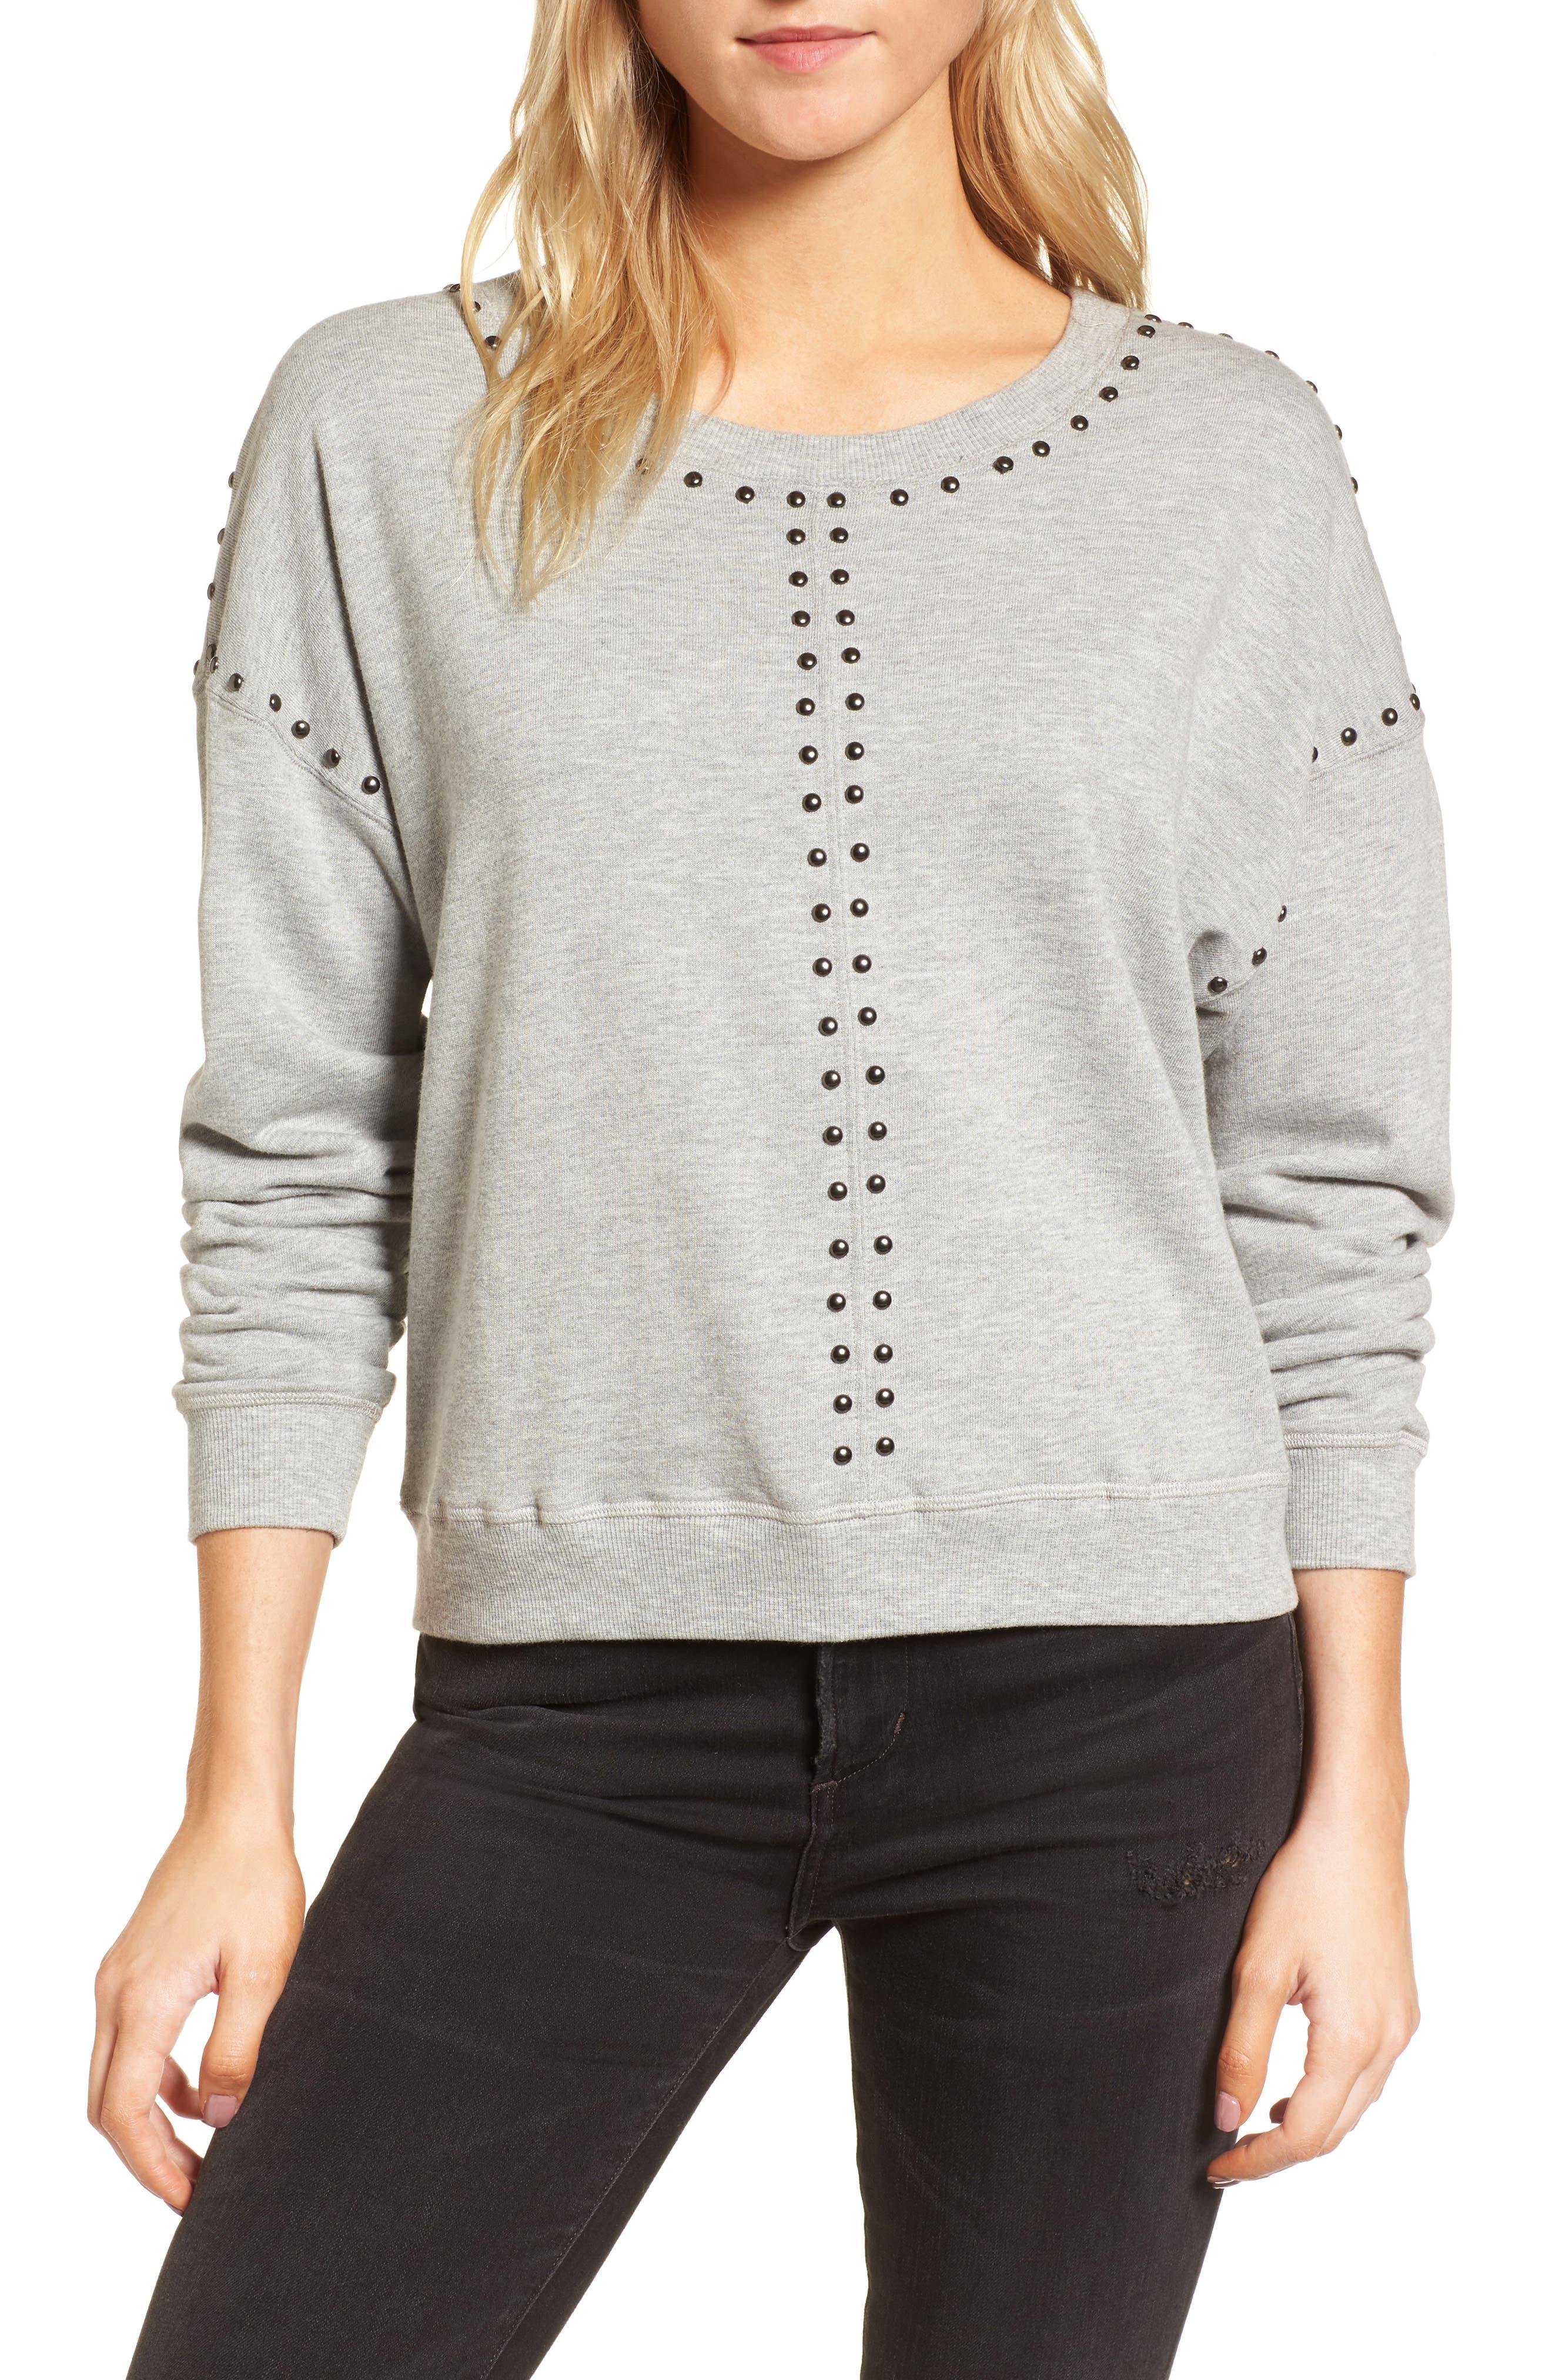 Wilson Studded Sweatshirt,                             Main thumbnail 1, color,                             Heather Grey